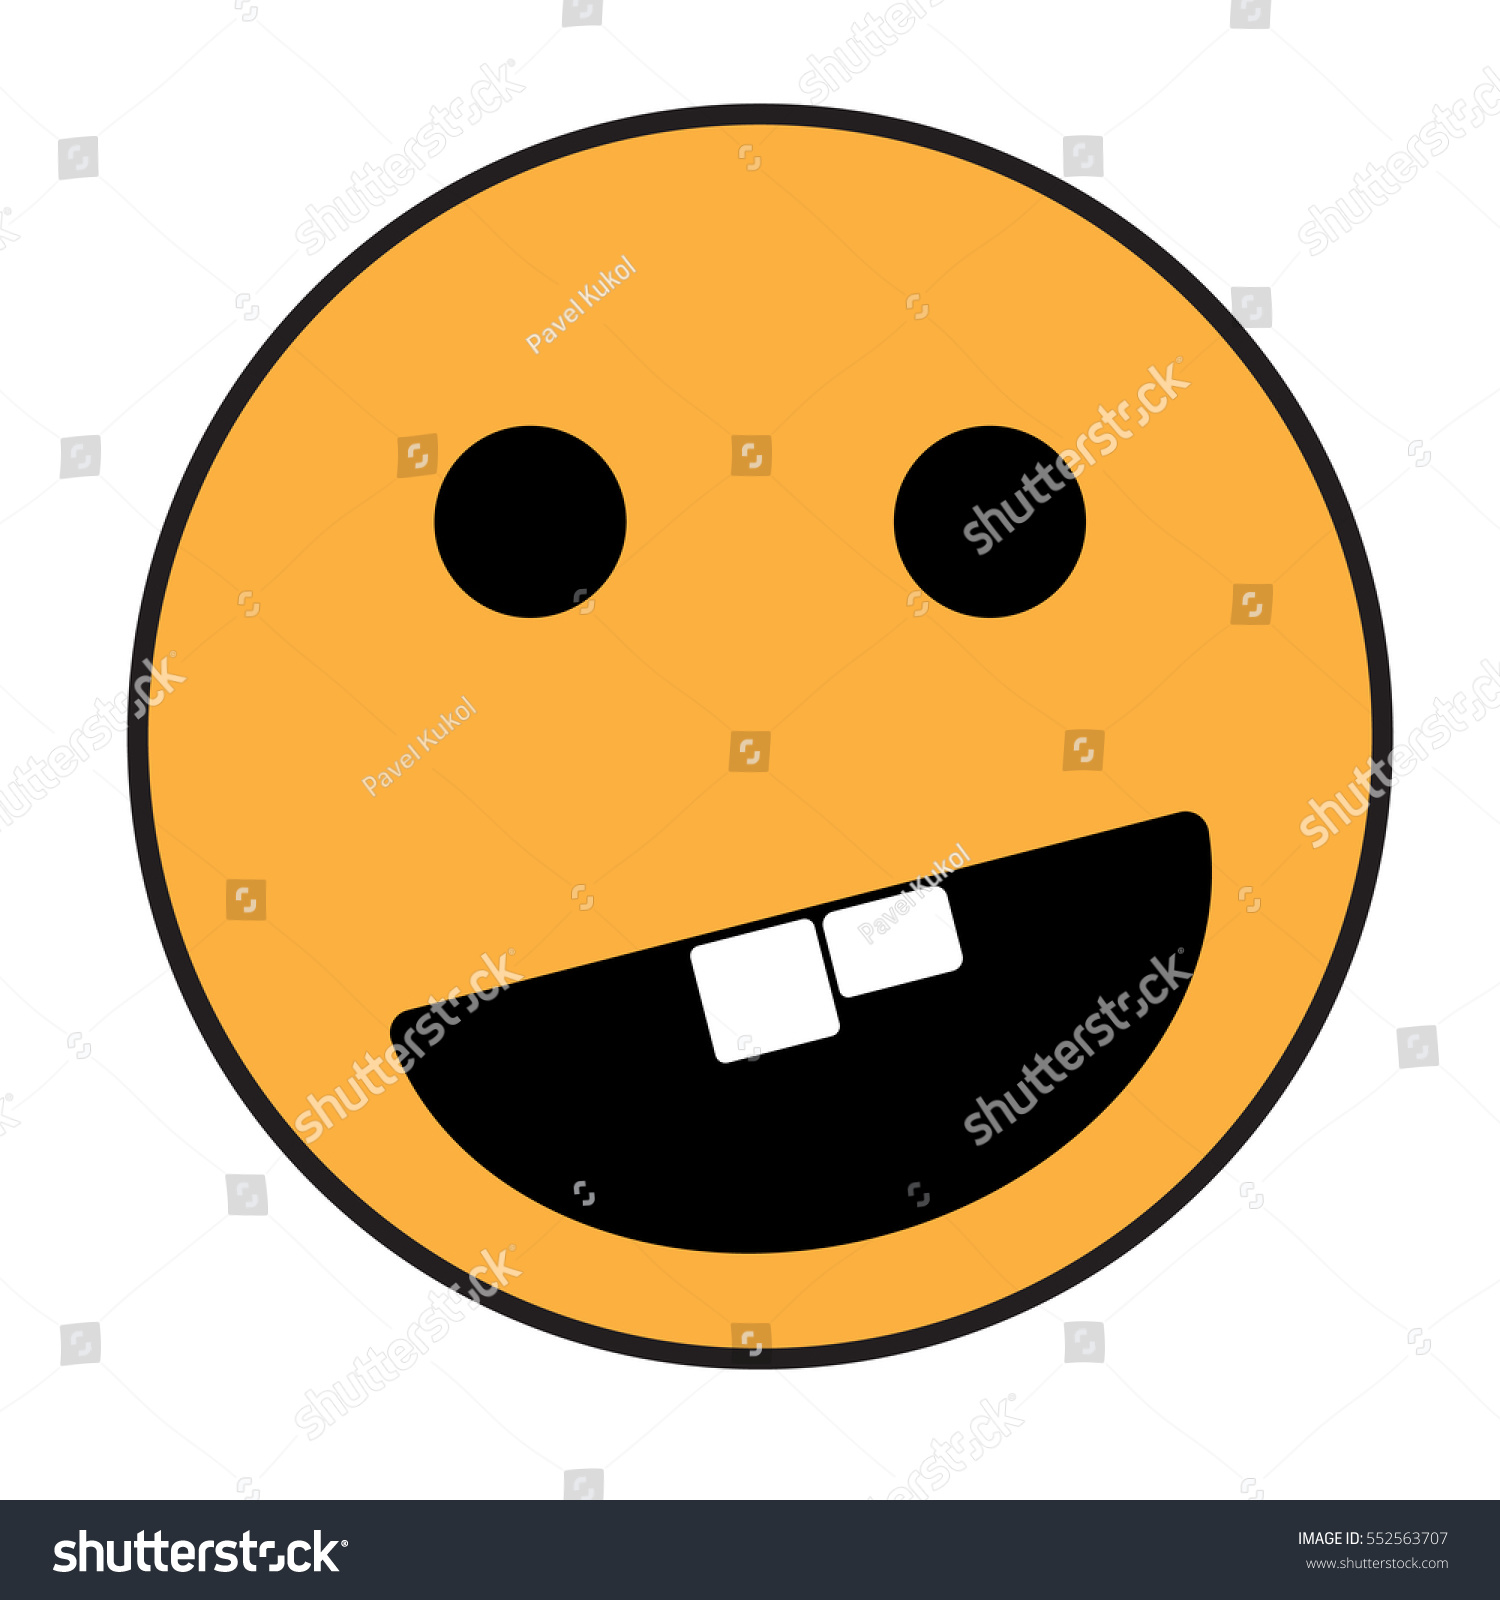 Smiley Face Yellow Orange Smile Poster Stock Vector